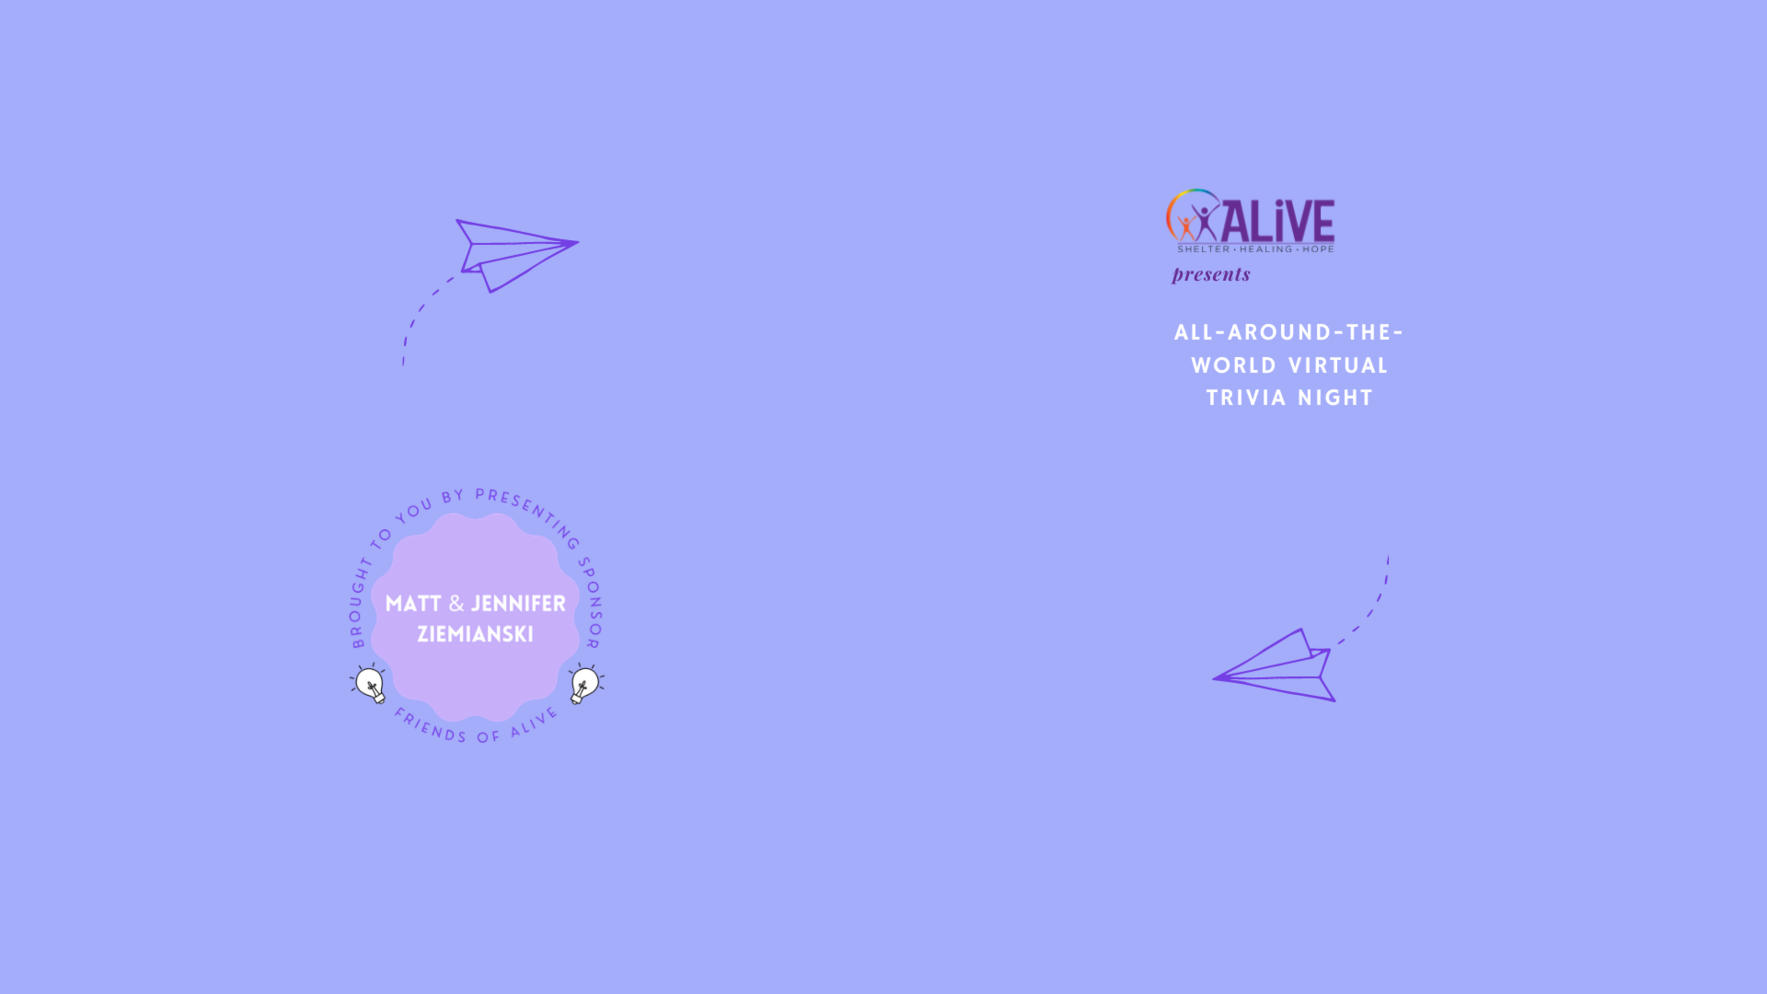 ALIVE's All Around the World Virtual Trivia Night image